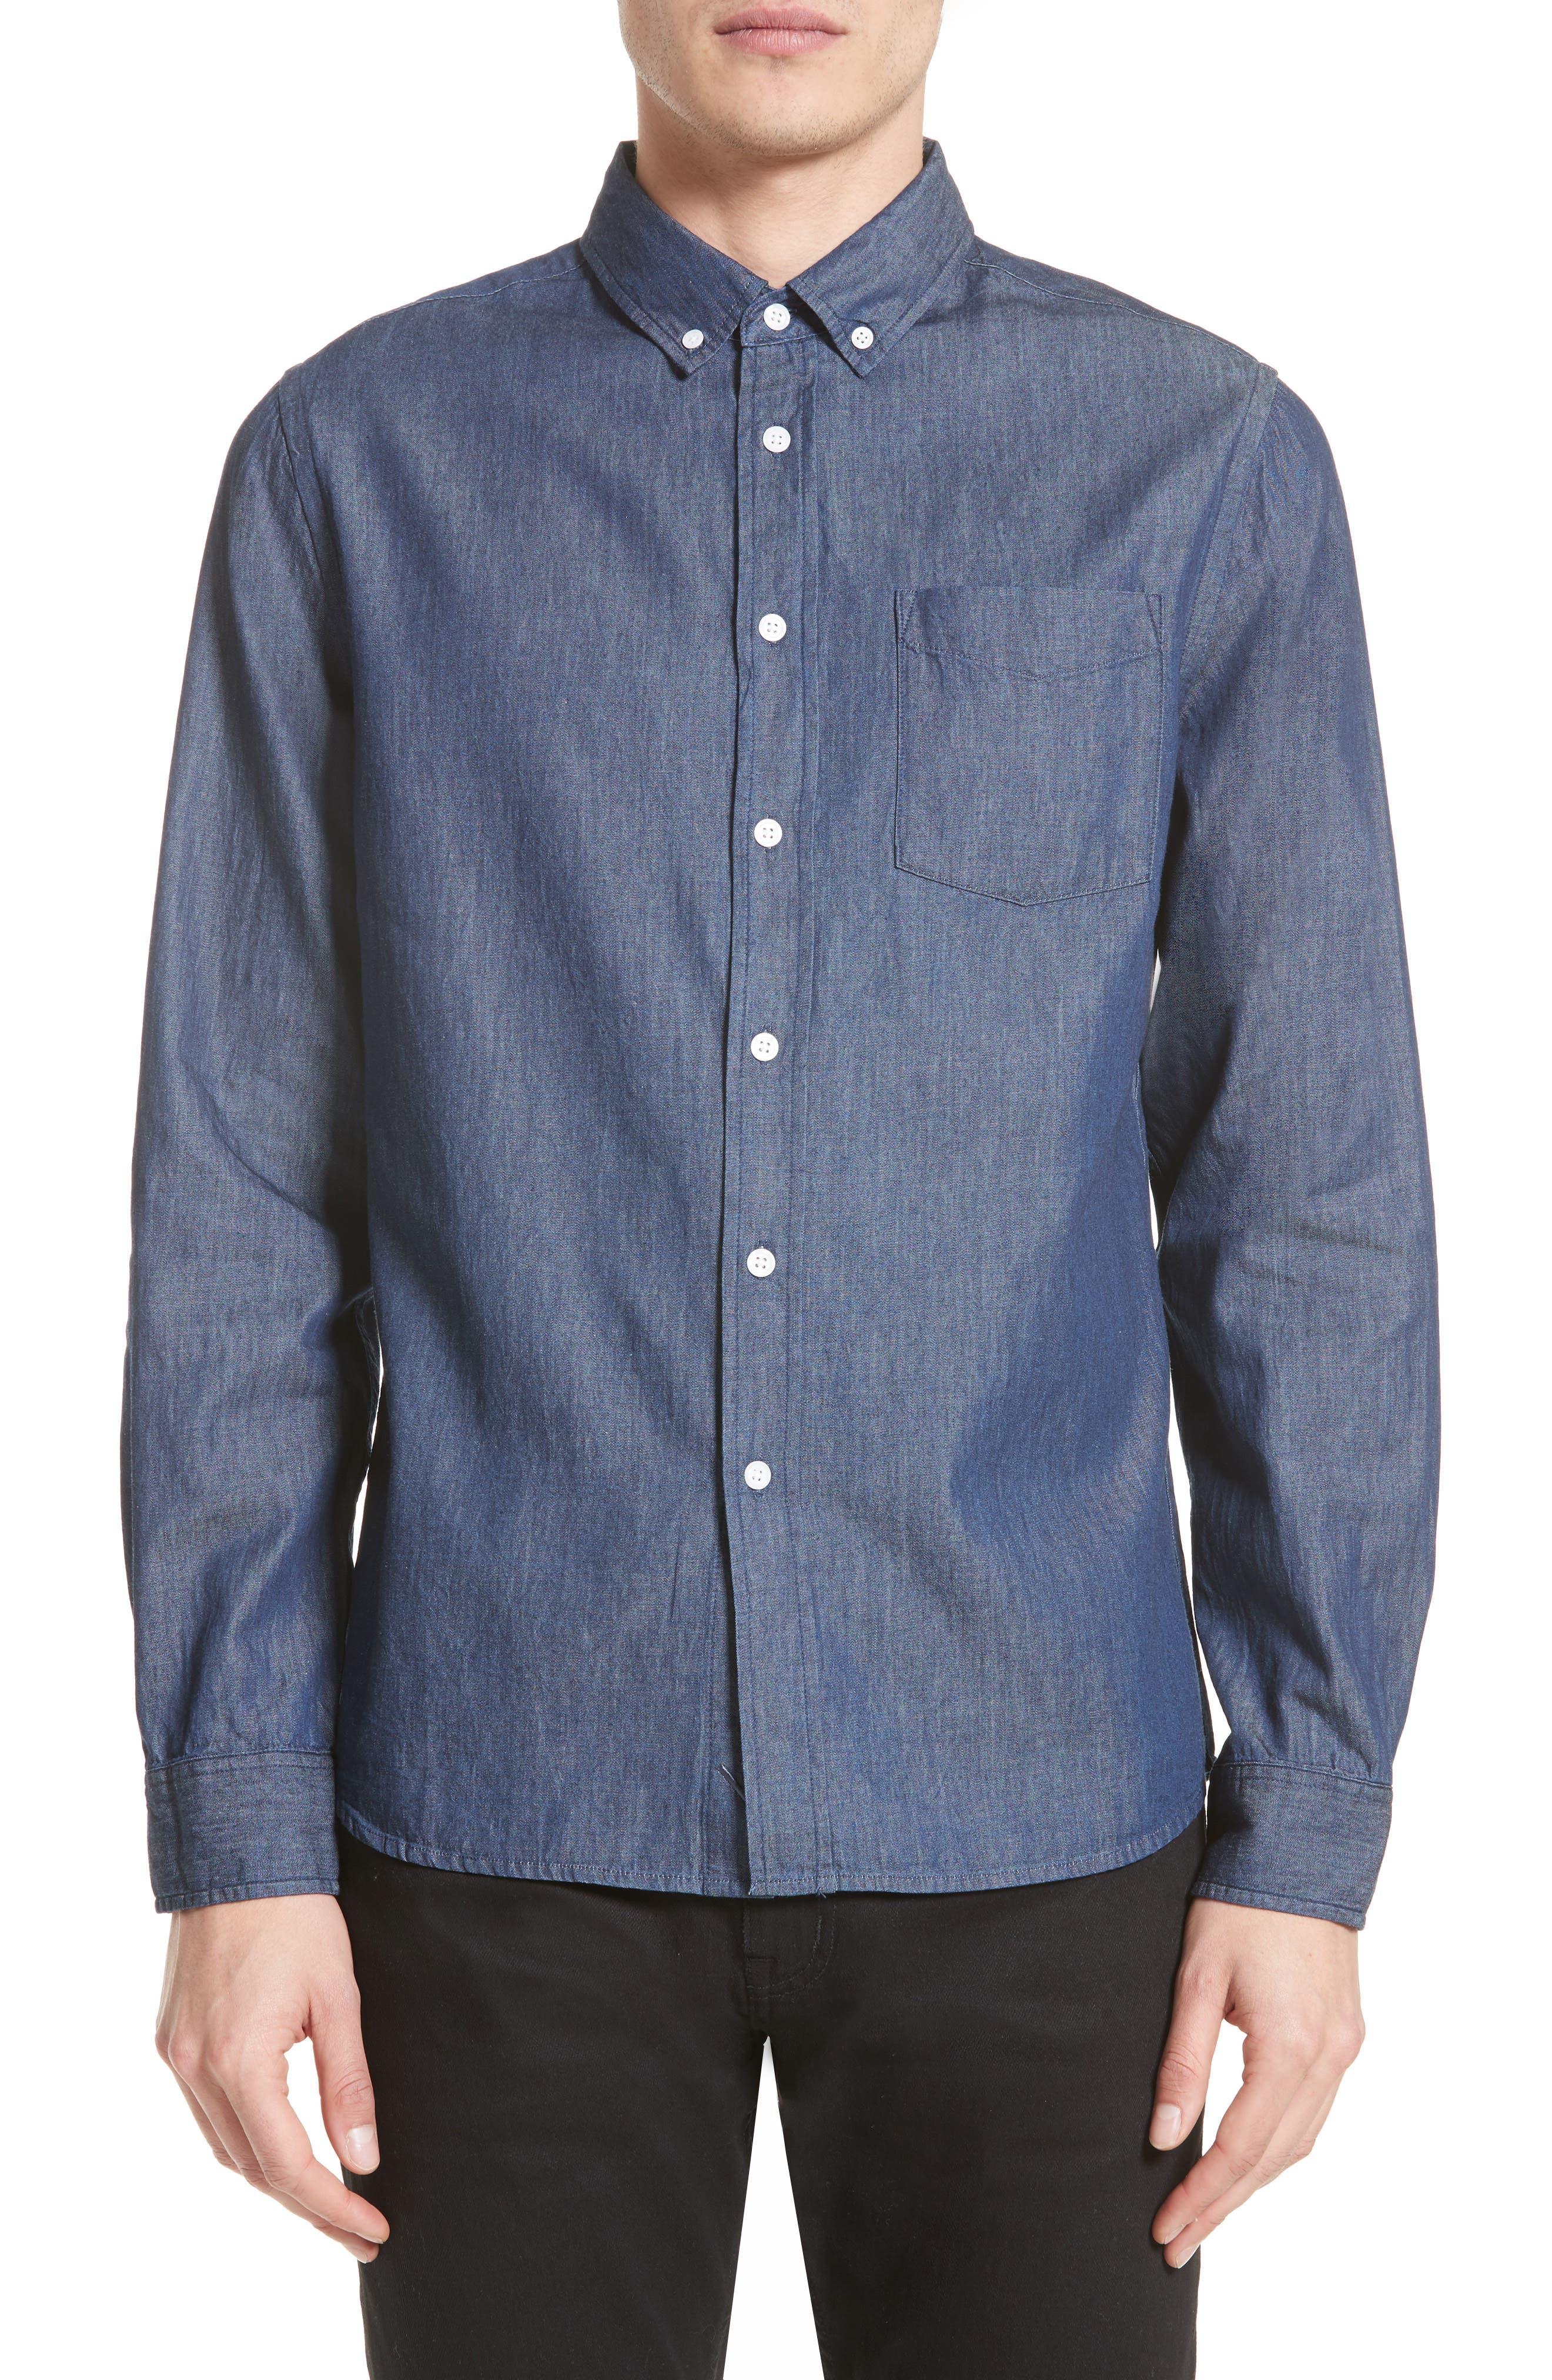 Main Image - Saturdays NYC Crosby Denim Slim Fit Sport Shirt